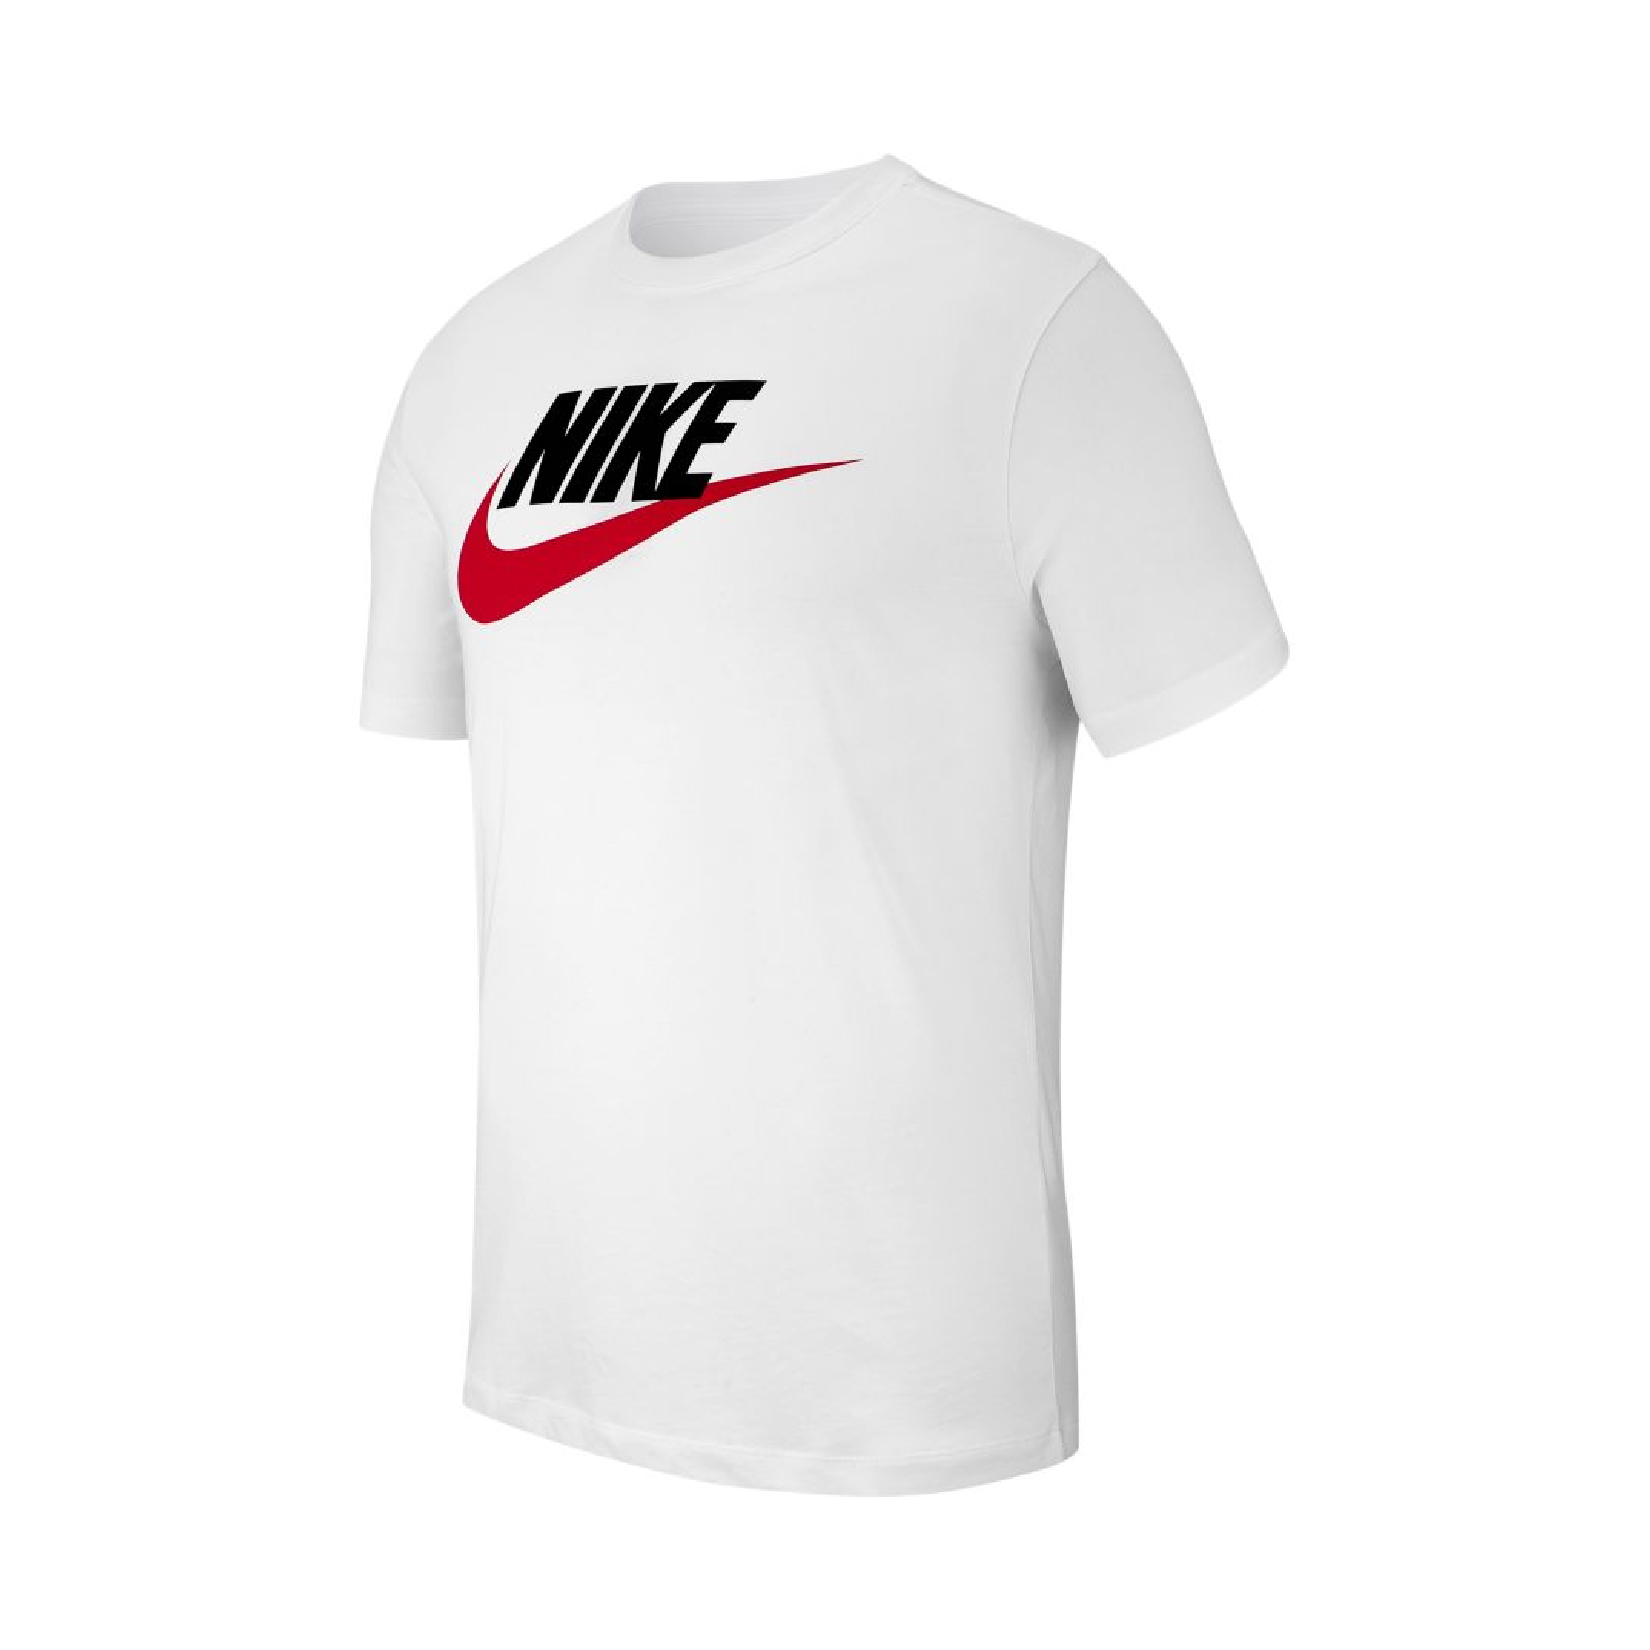 Nike Sportswear T-Shirt White - Red